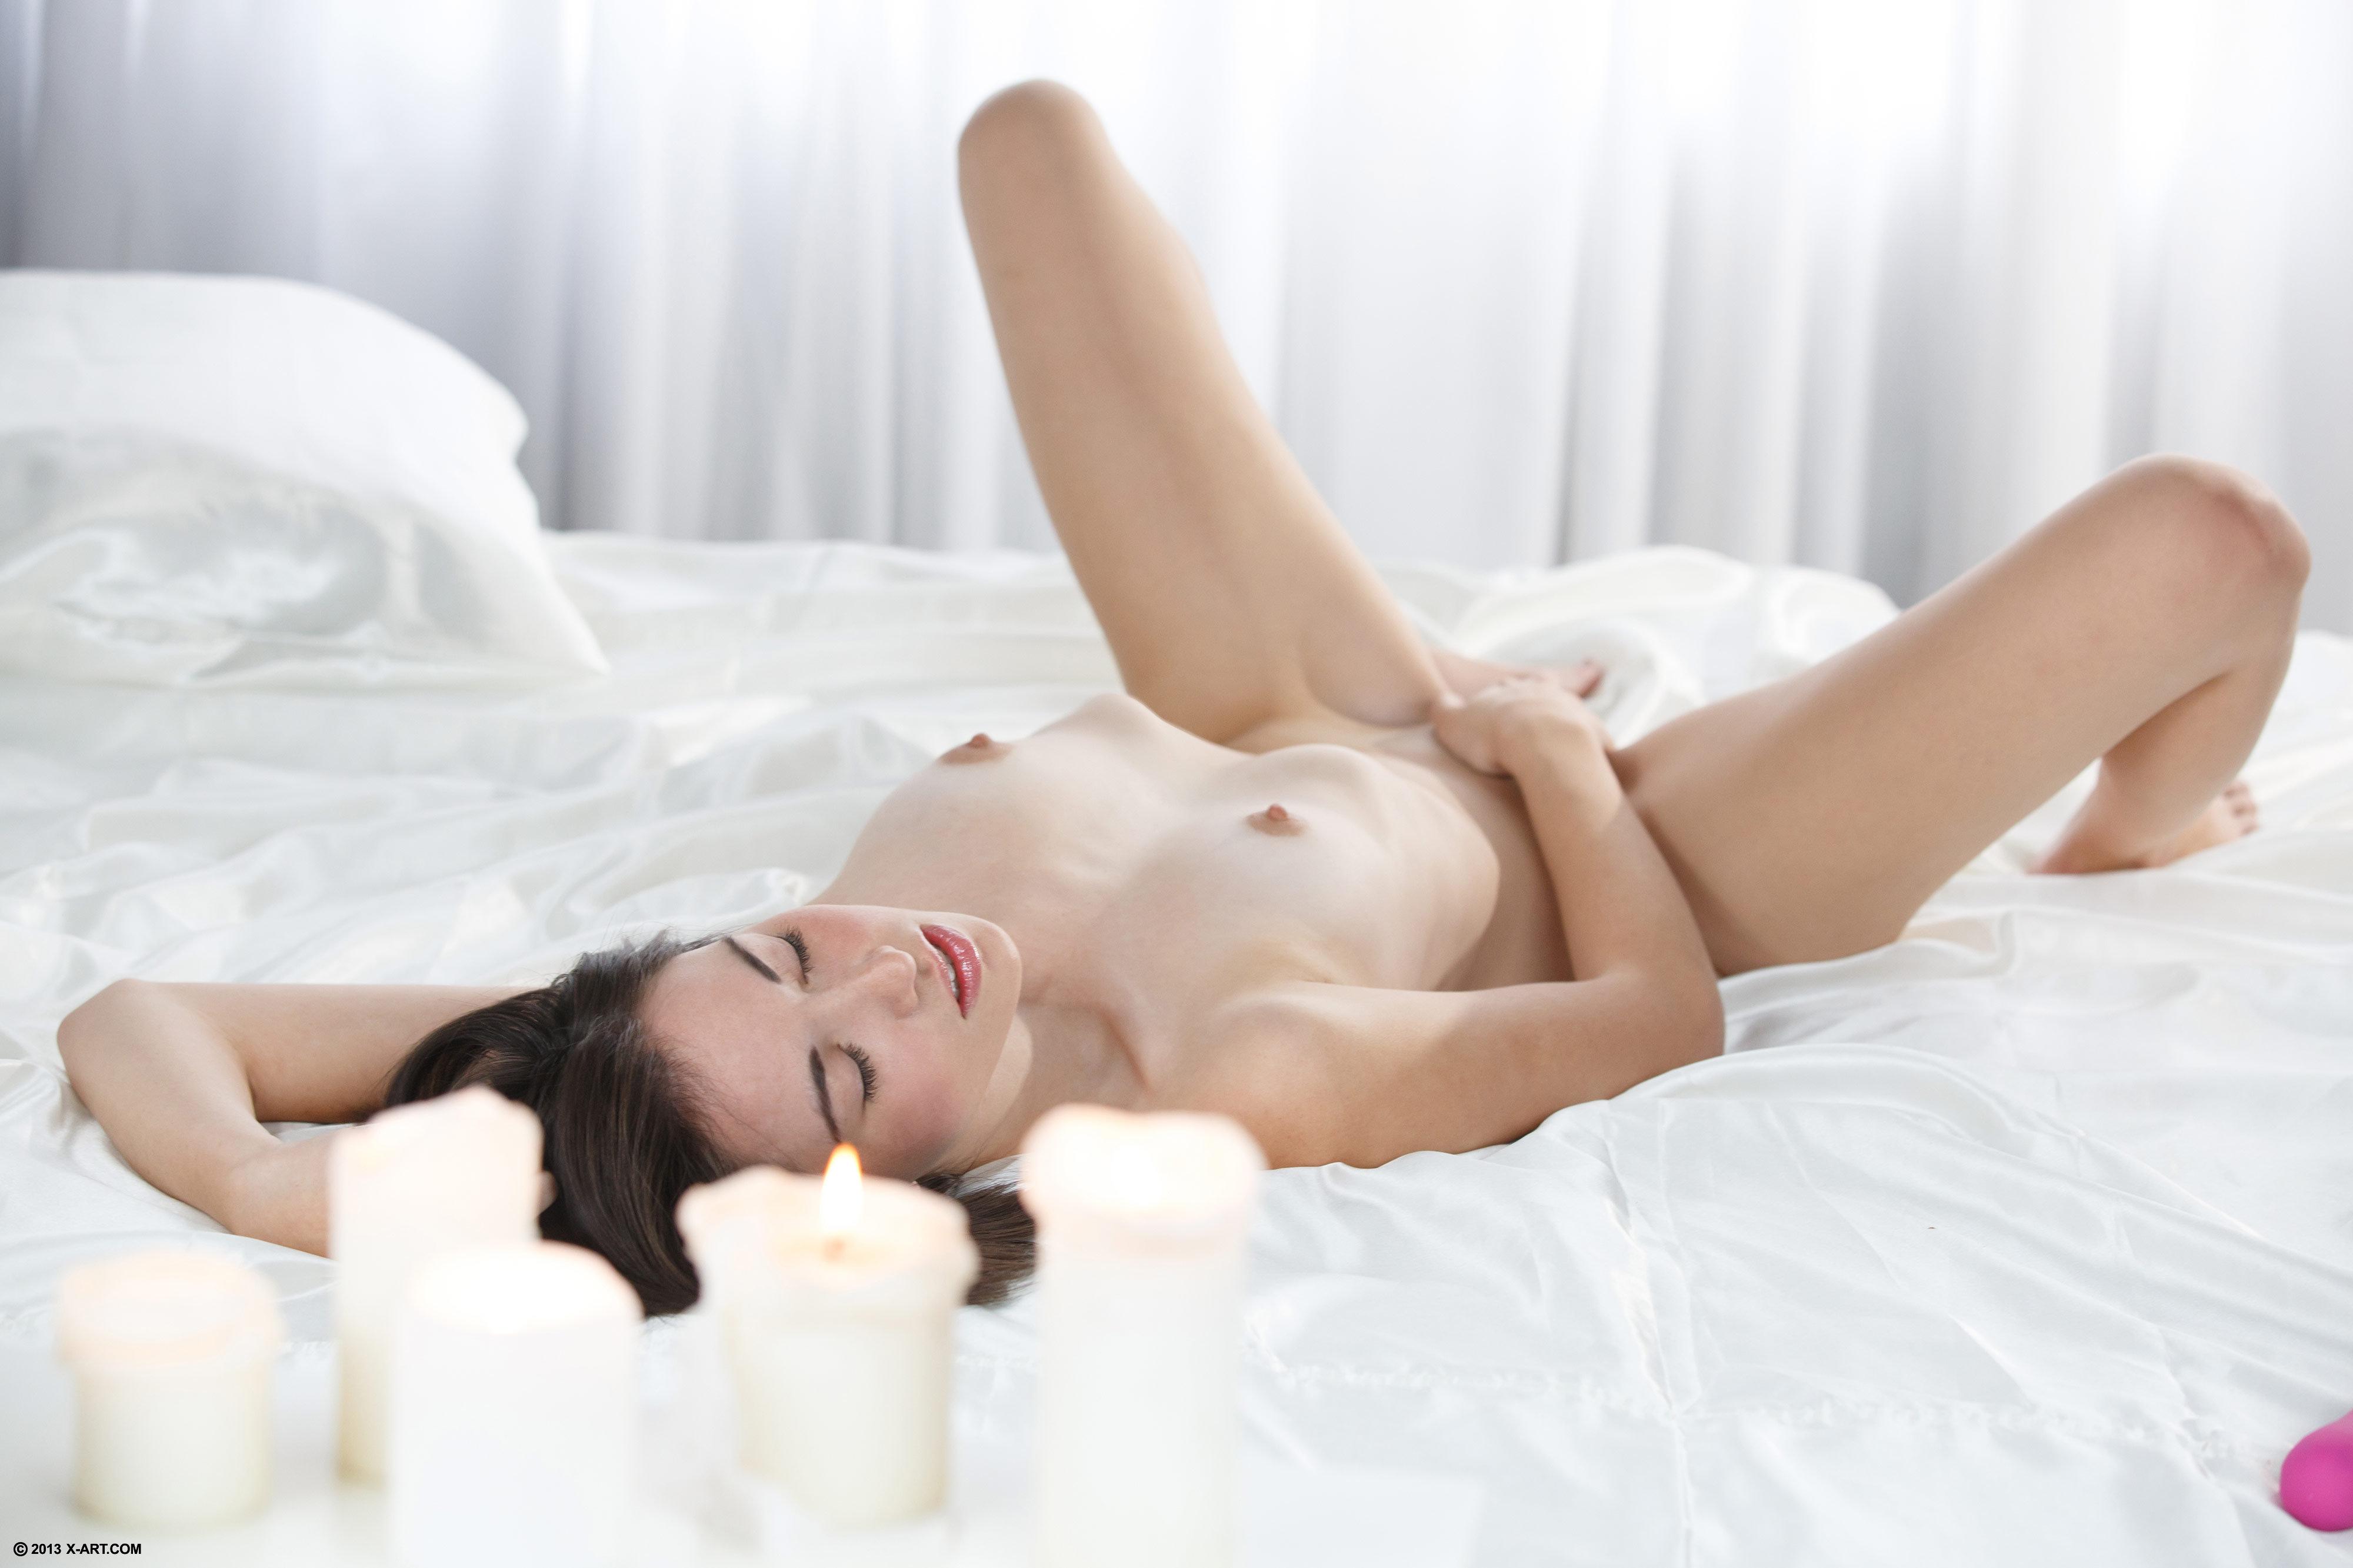 katrina hallili sex scandal